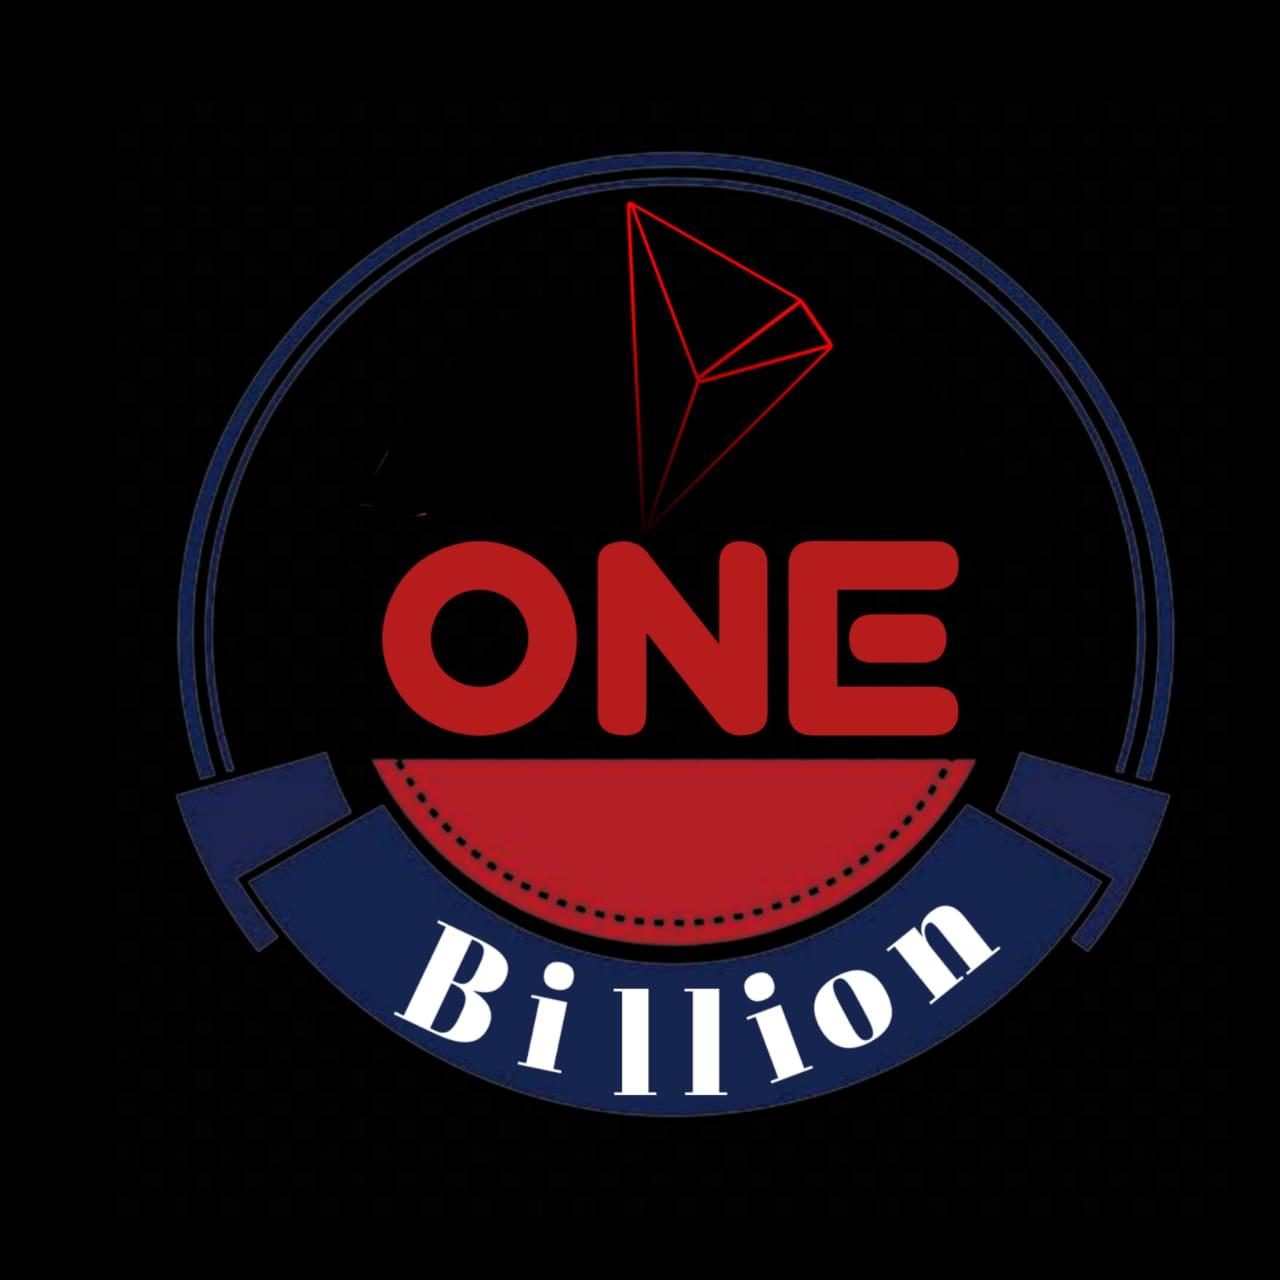 1 Billion Tron logo